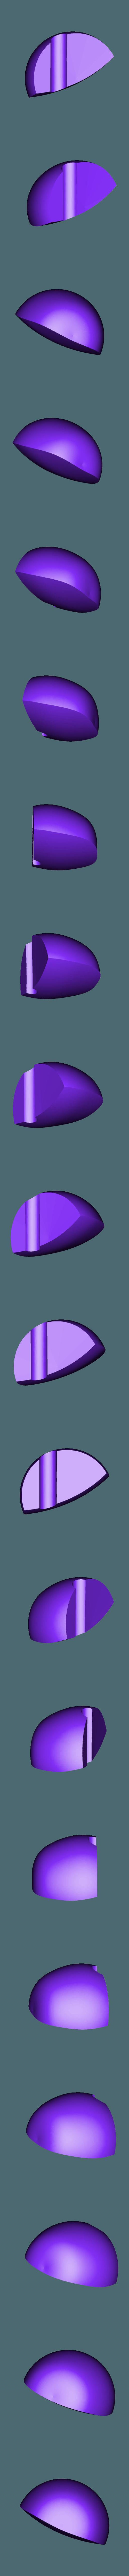 eye left white.stl Télécharger fichier STL gratuit Badtz-Maru (バッドばつ丸, Baddo Batsu Maru) • Modèle pour impression 3D, Jangie